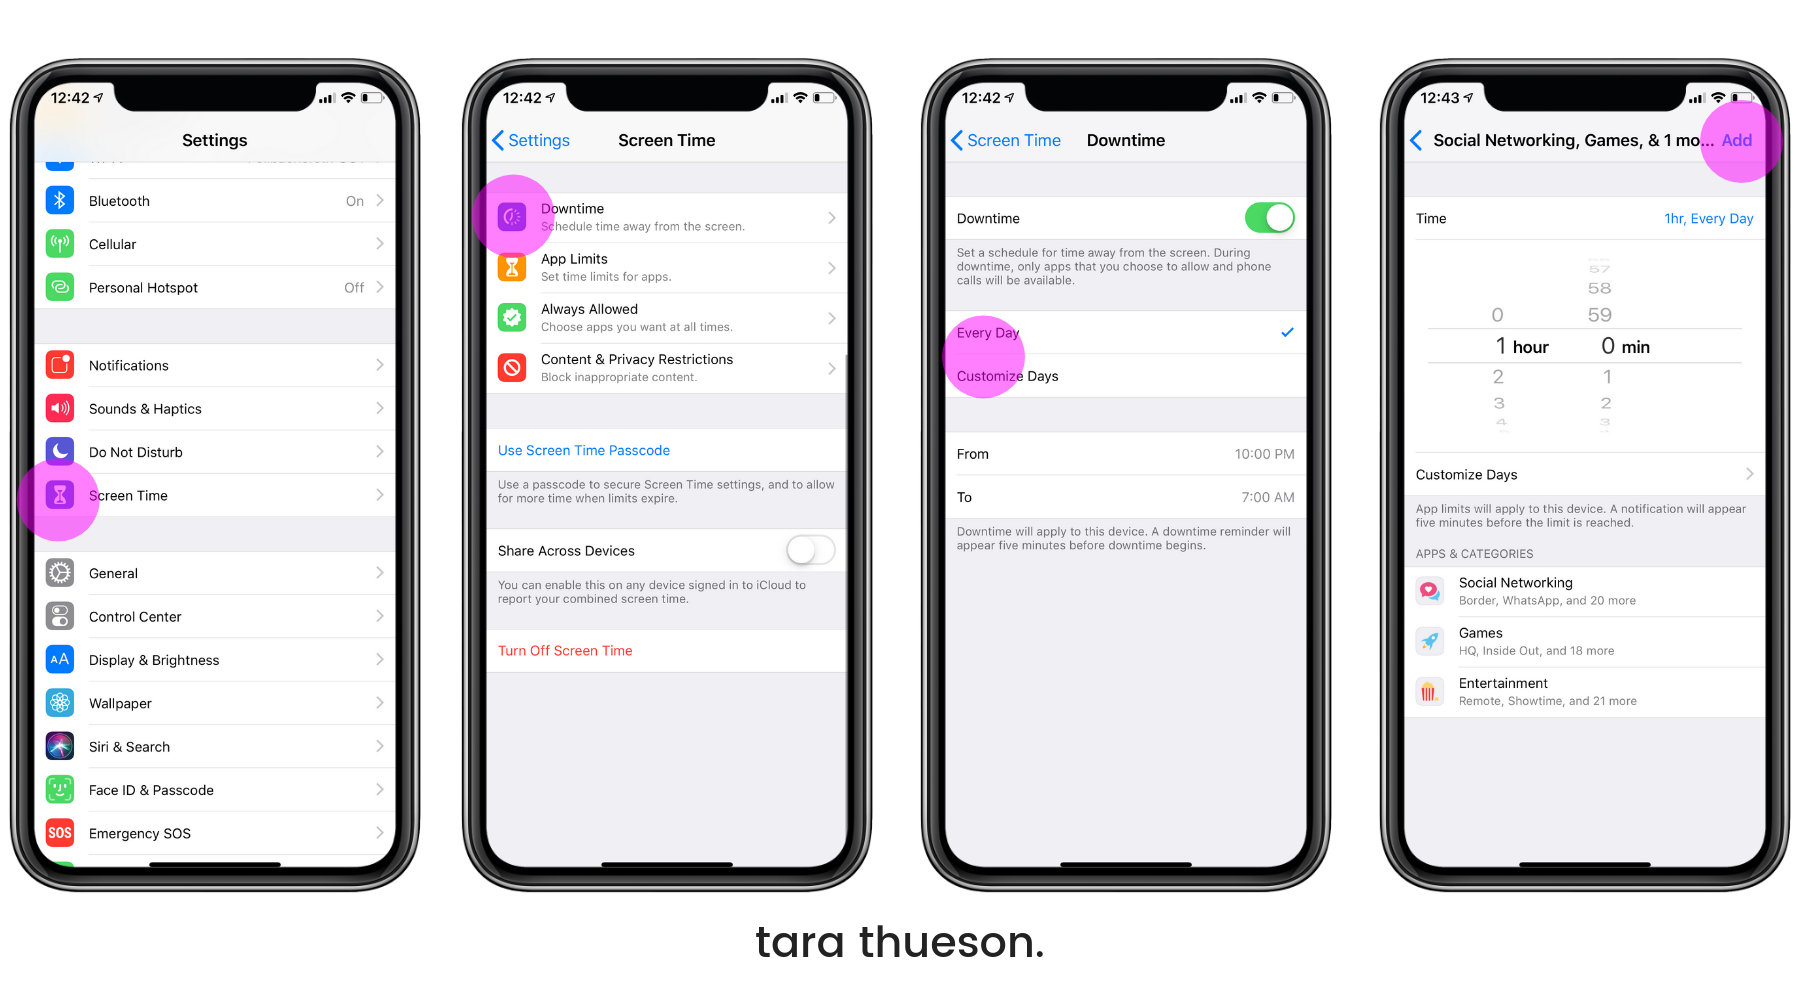 Tech Tuesday: iPhone Hacks – Tara Thueson